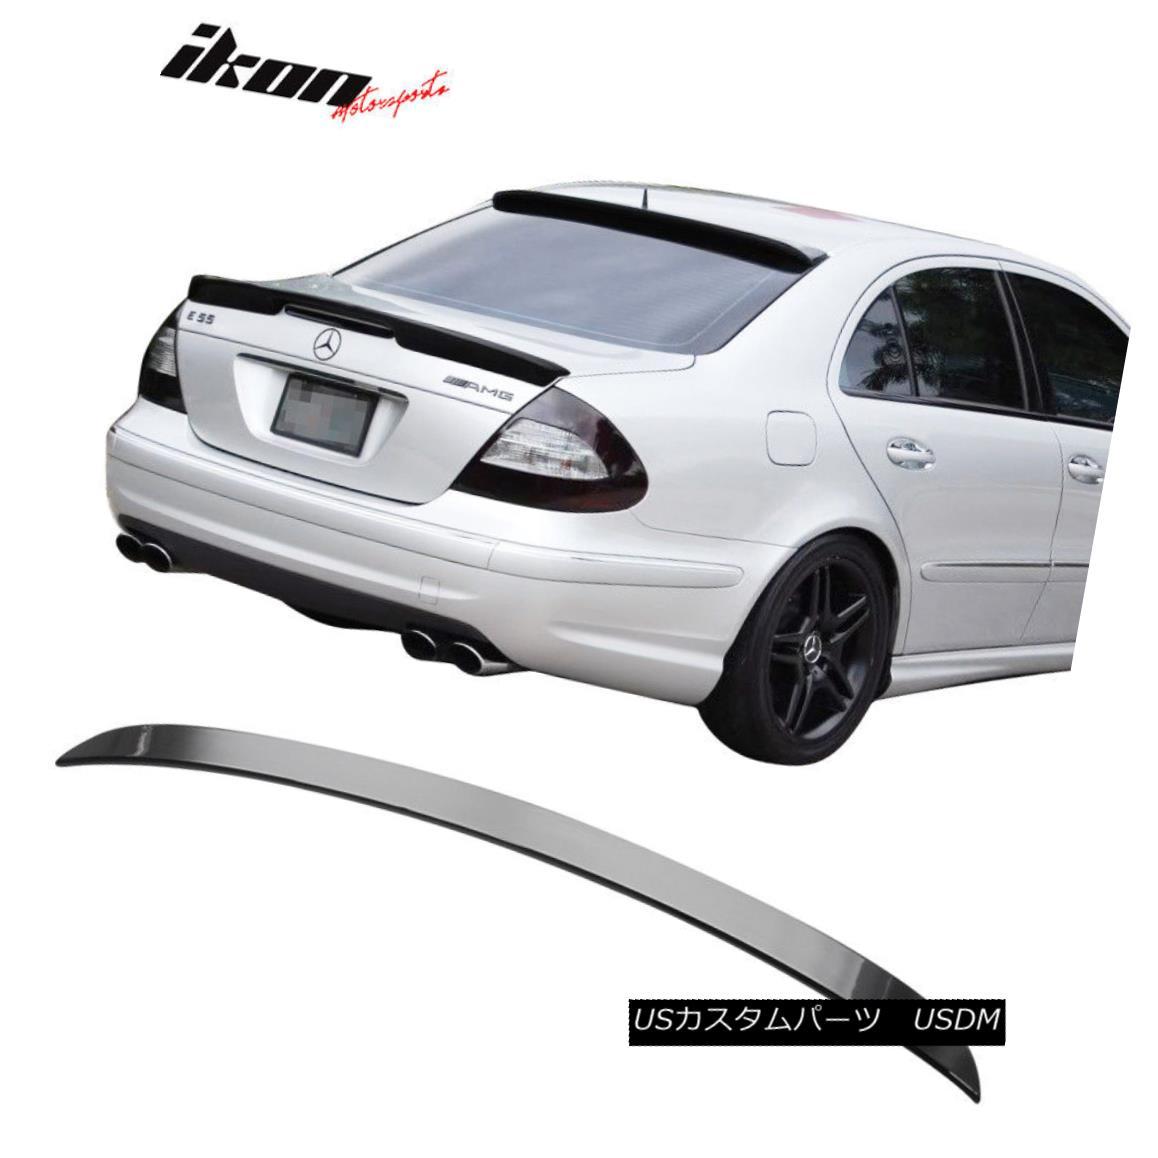 Painted ABS Rear Trunk Spoiler For 03-09 Mercedes Benz E-Class 040 BLACK